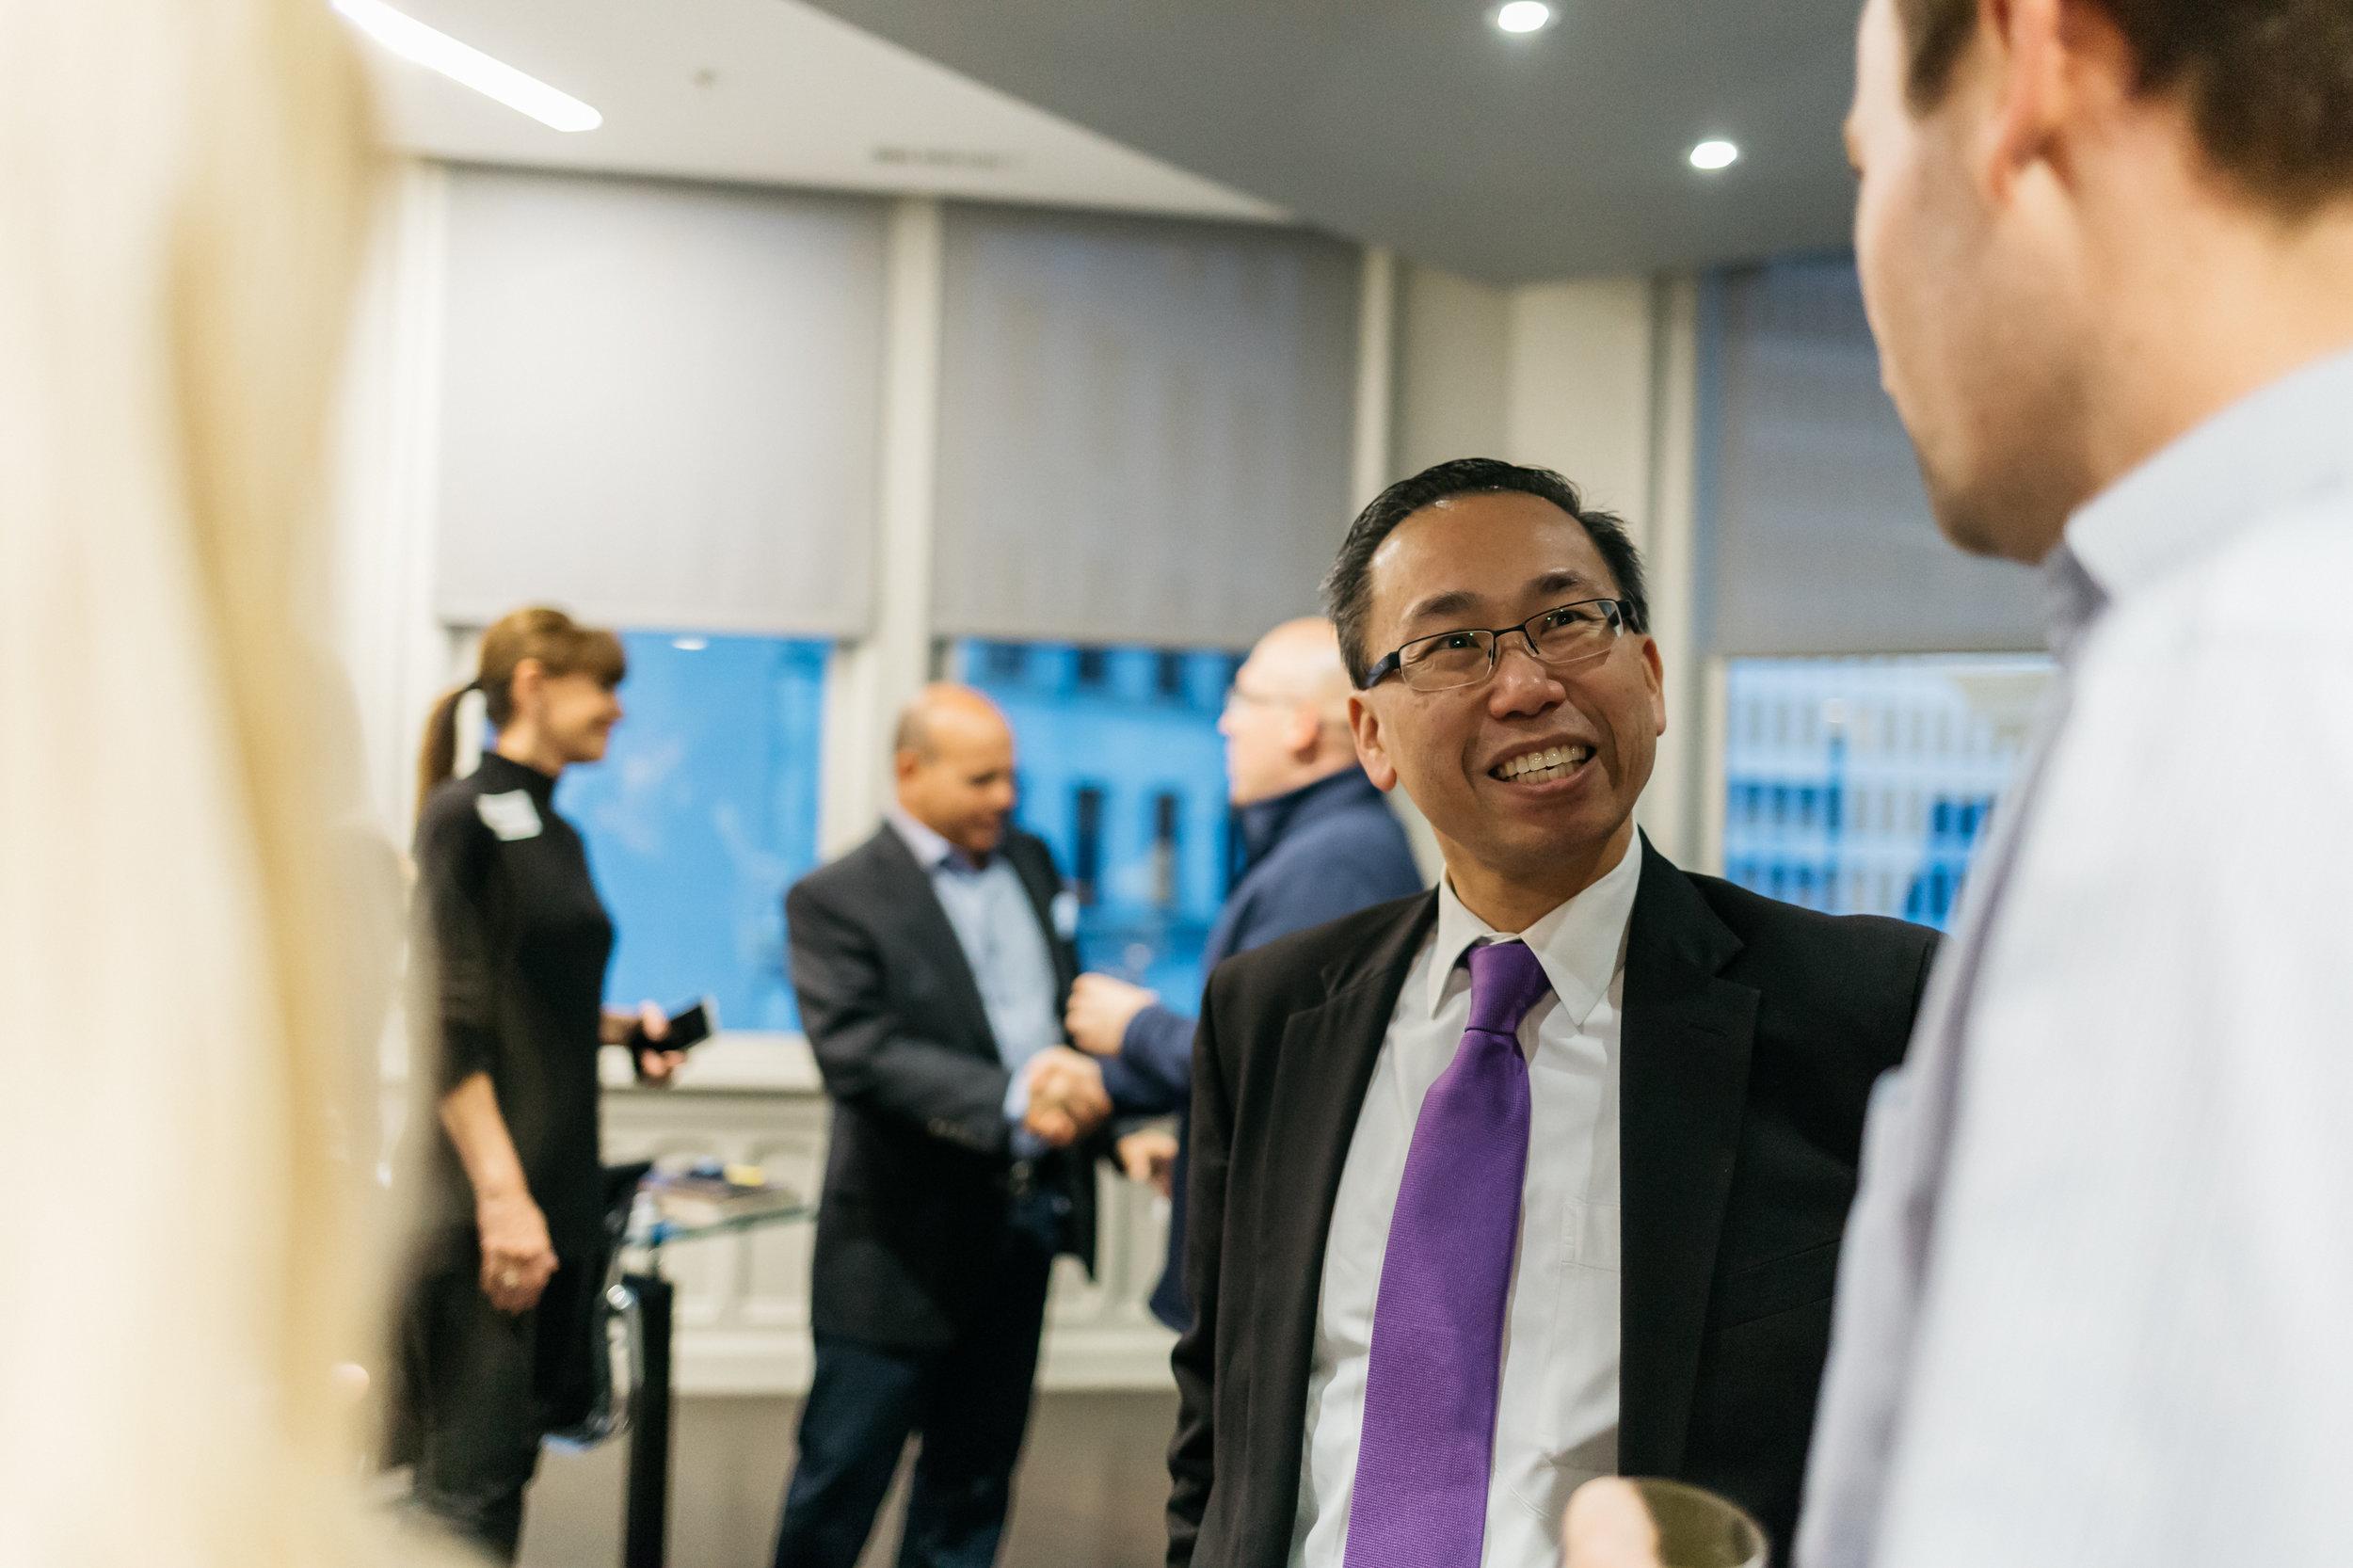 Mayor Fung Event - Photo 4.jpg